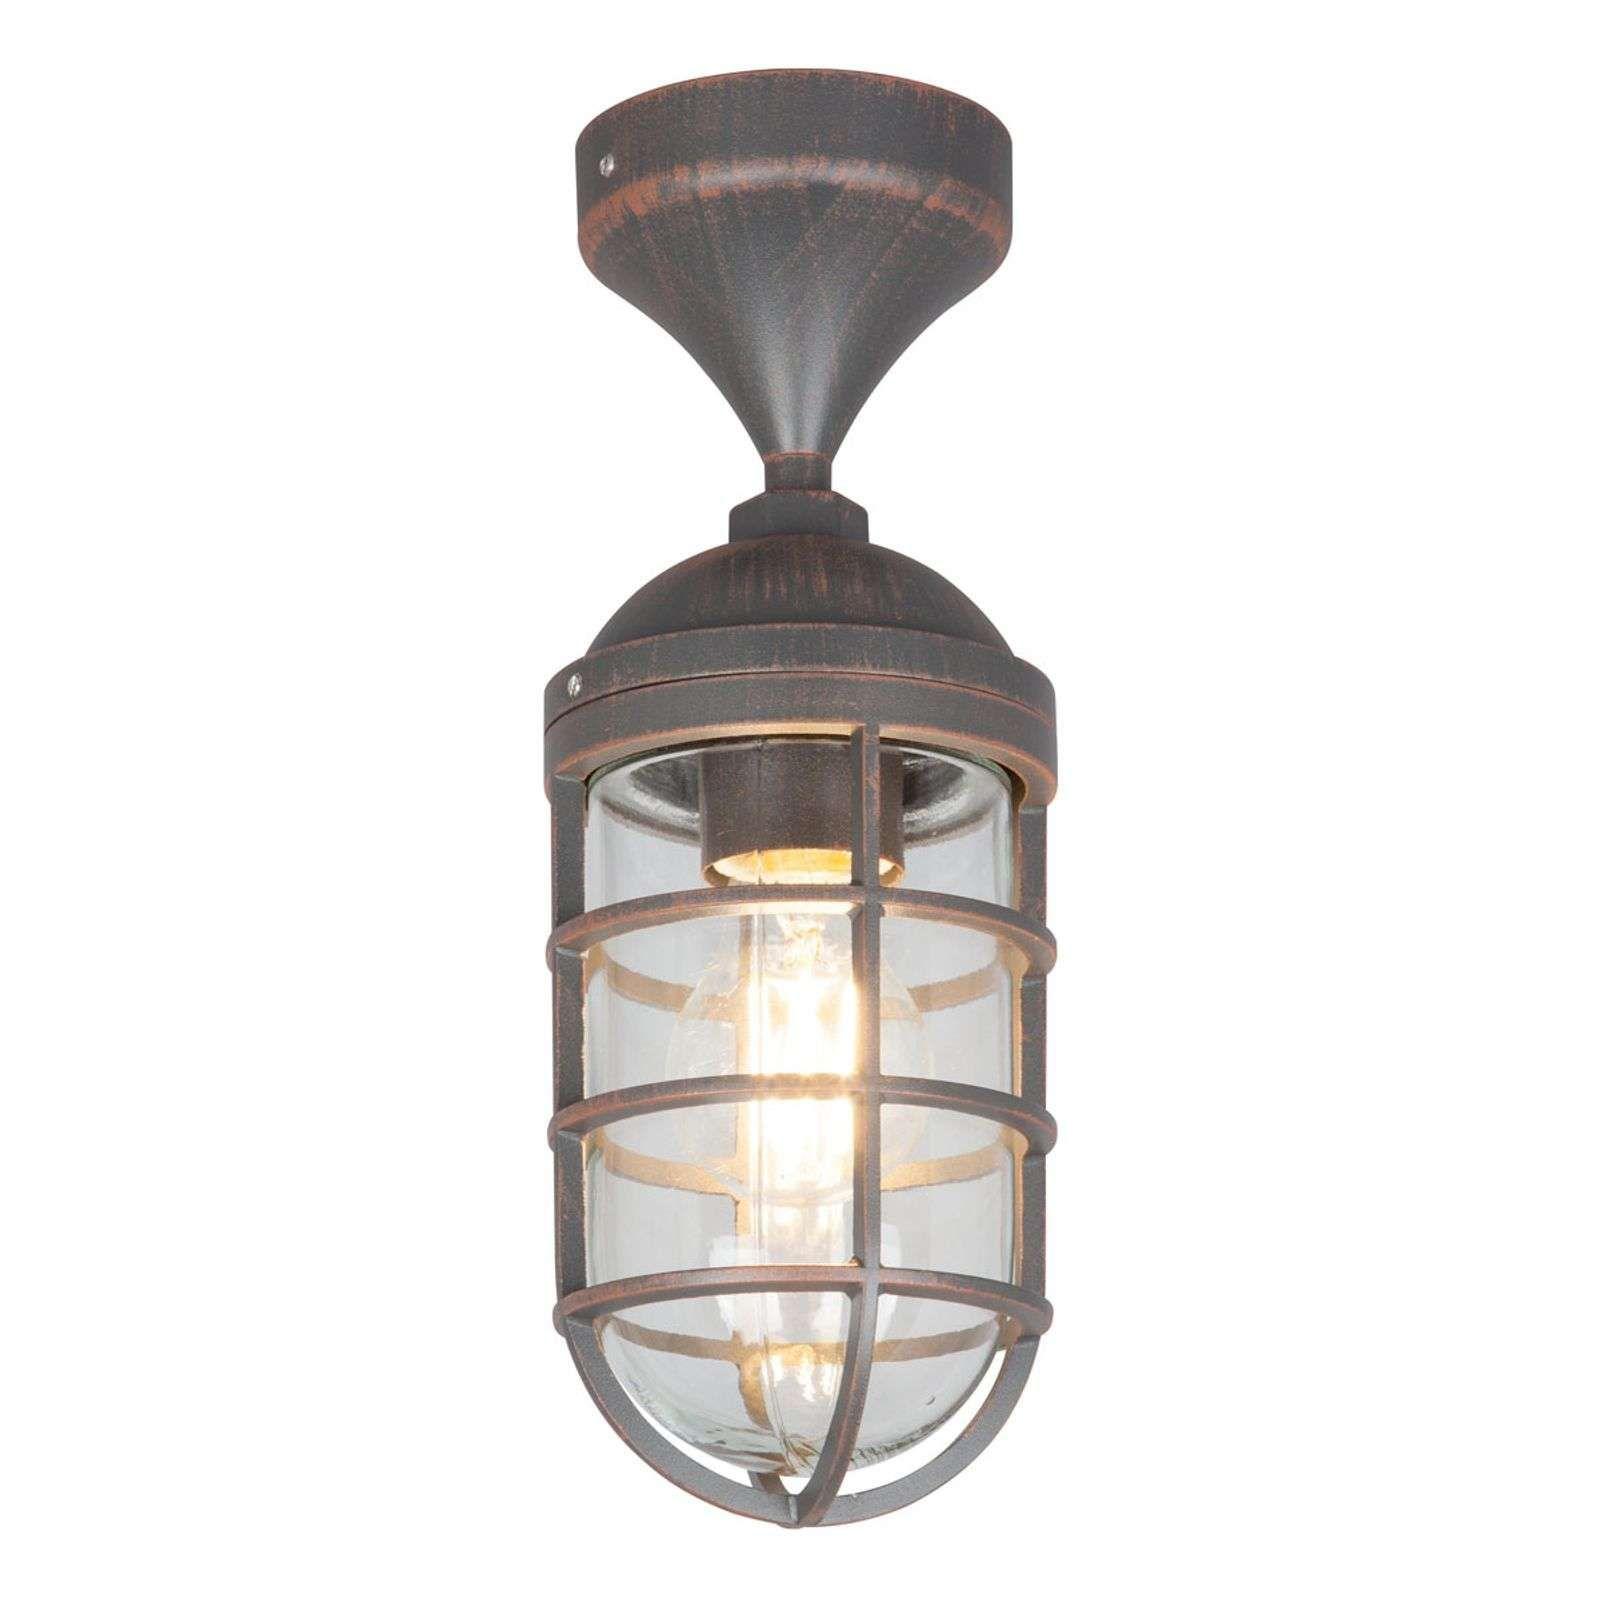 Plafonnier Gero En Fonte D Aluminium In 2020 Plafondlamp Keramische Lampen Lamp Makeover